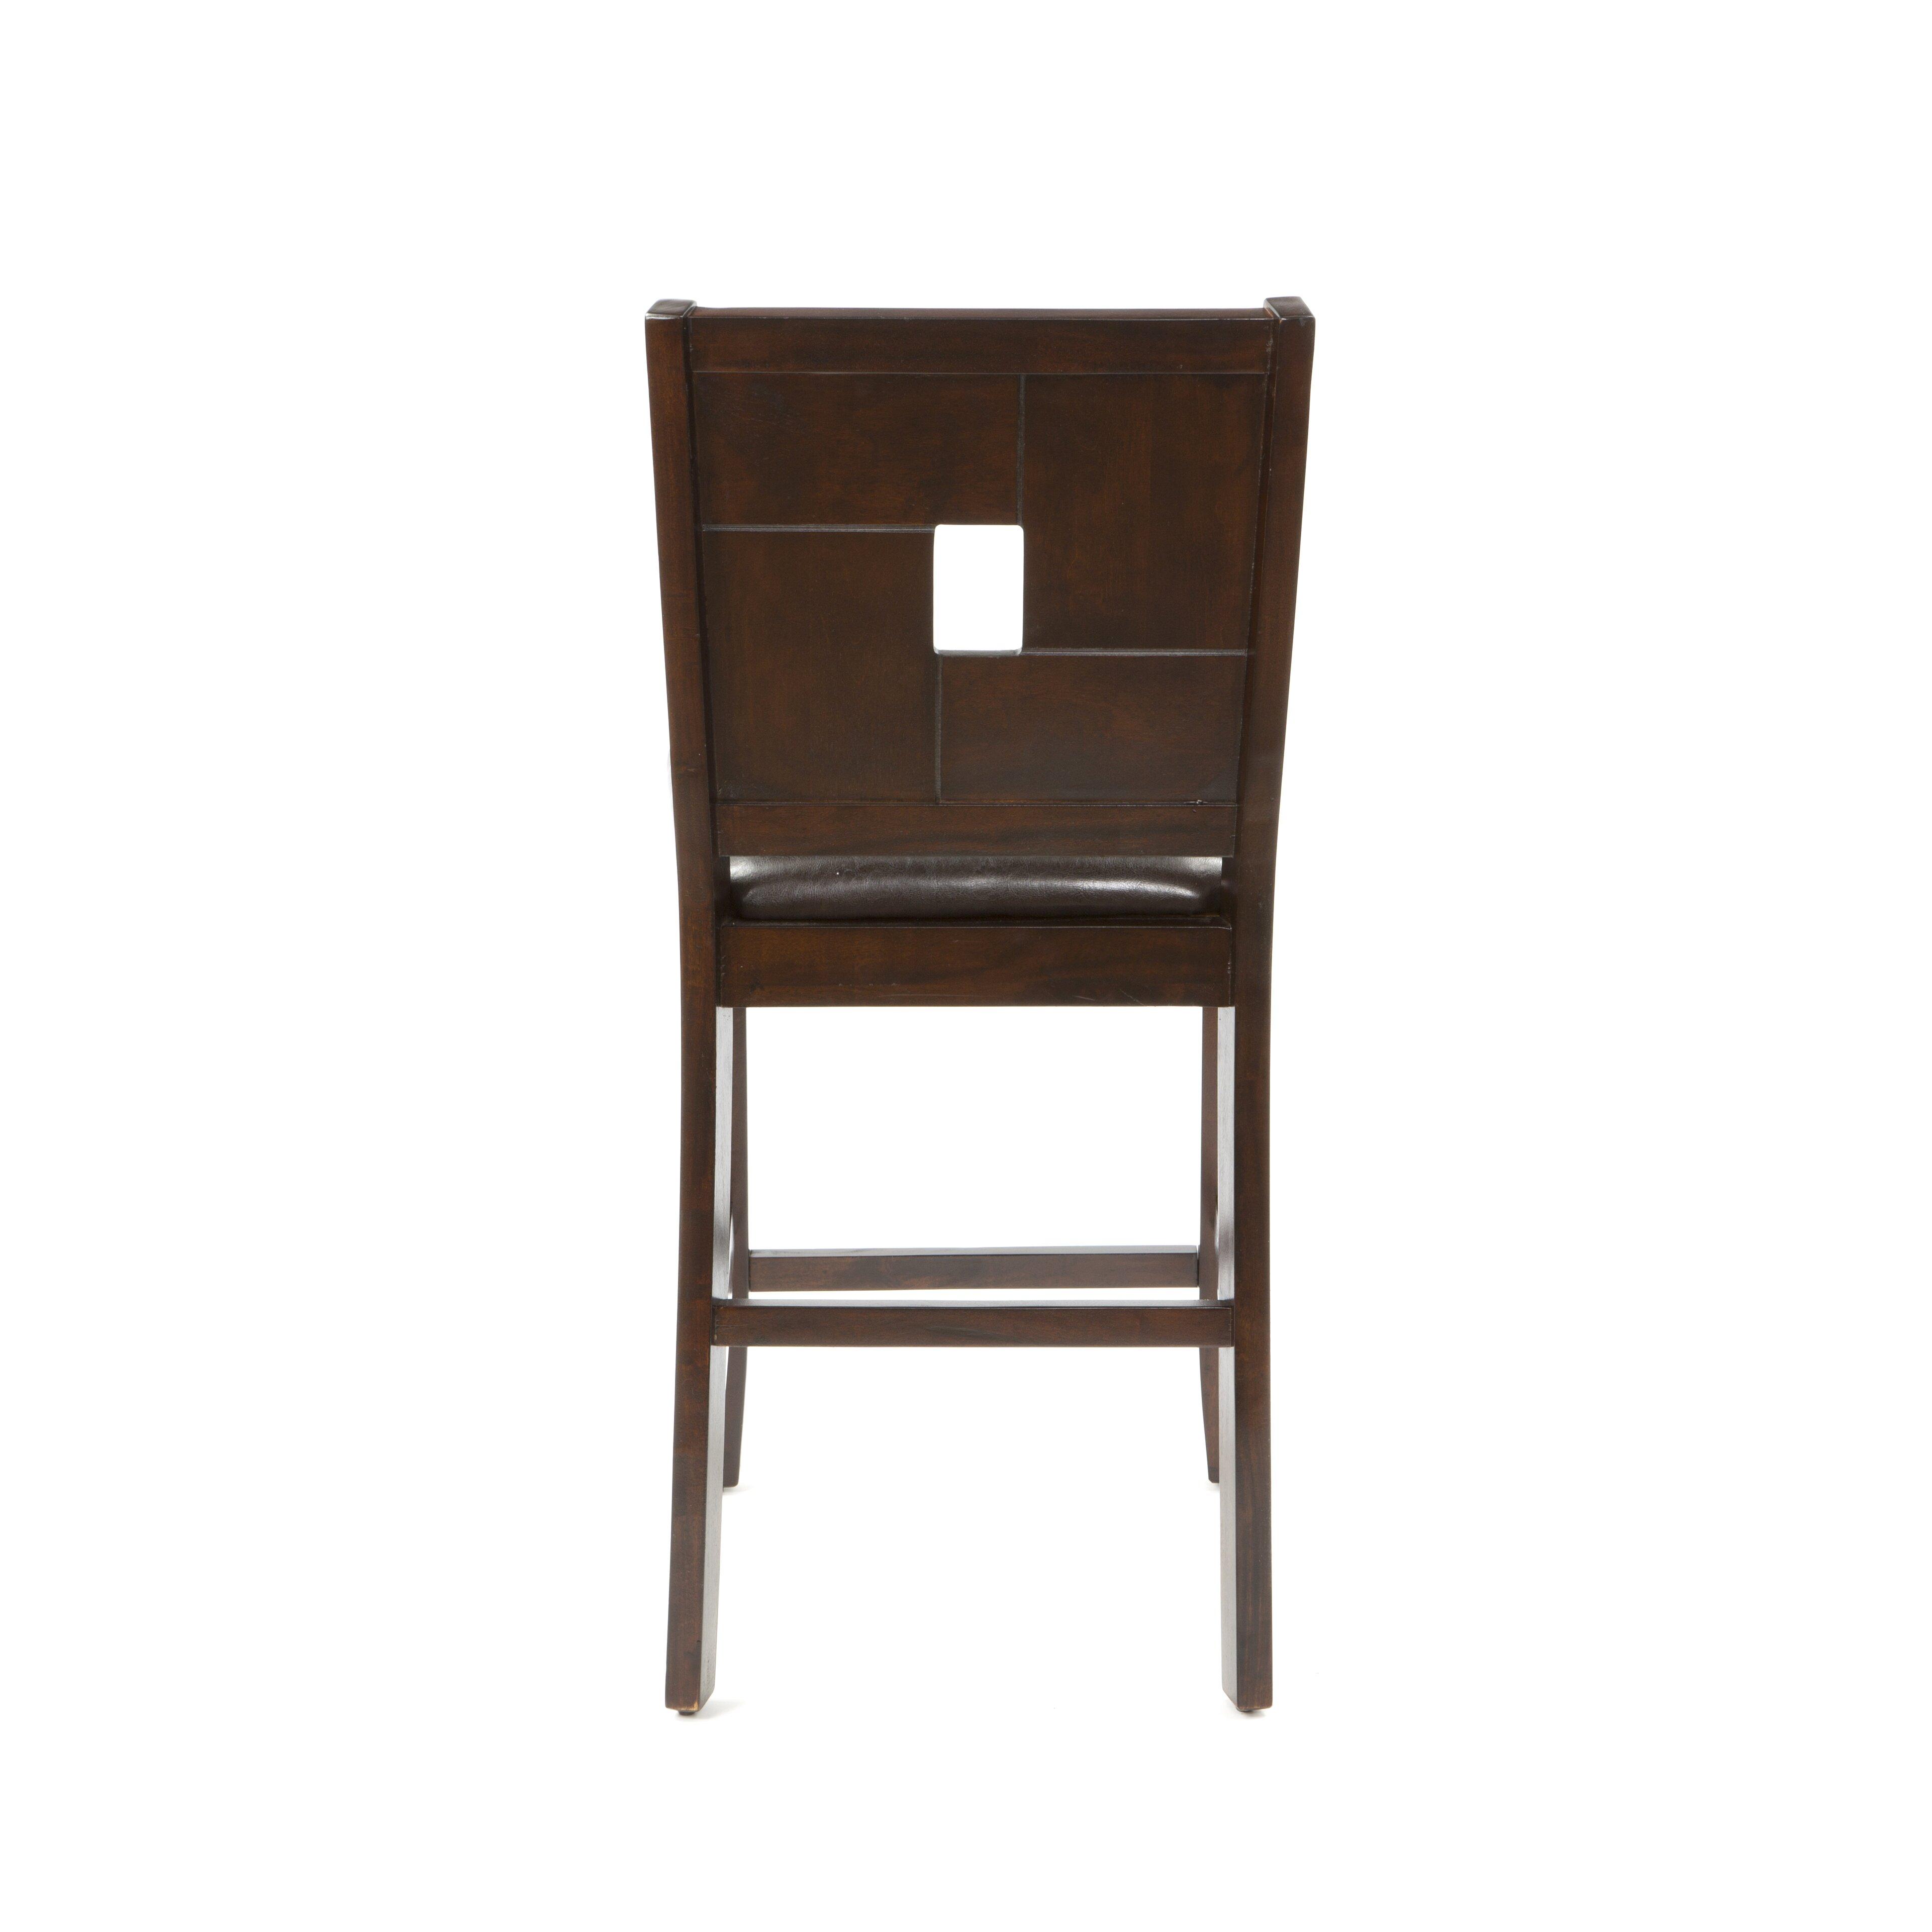 "Alpine Furniture Lakeport 25 5"" Bar Stool & Reviews"